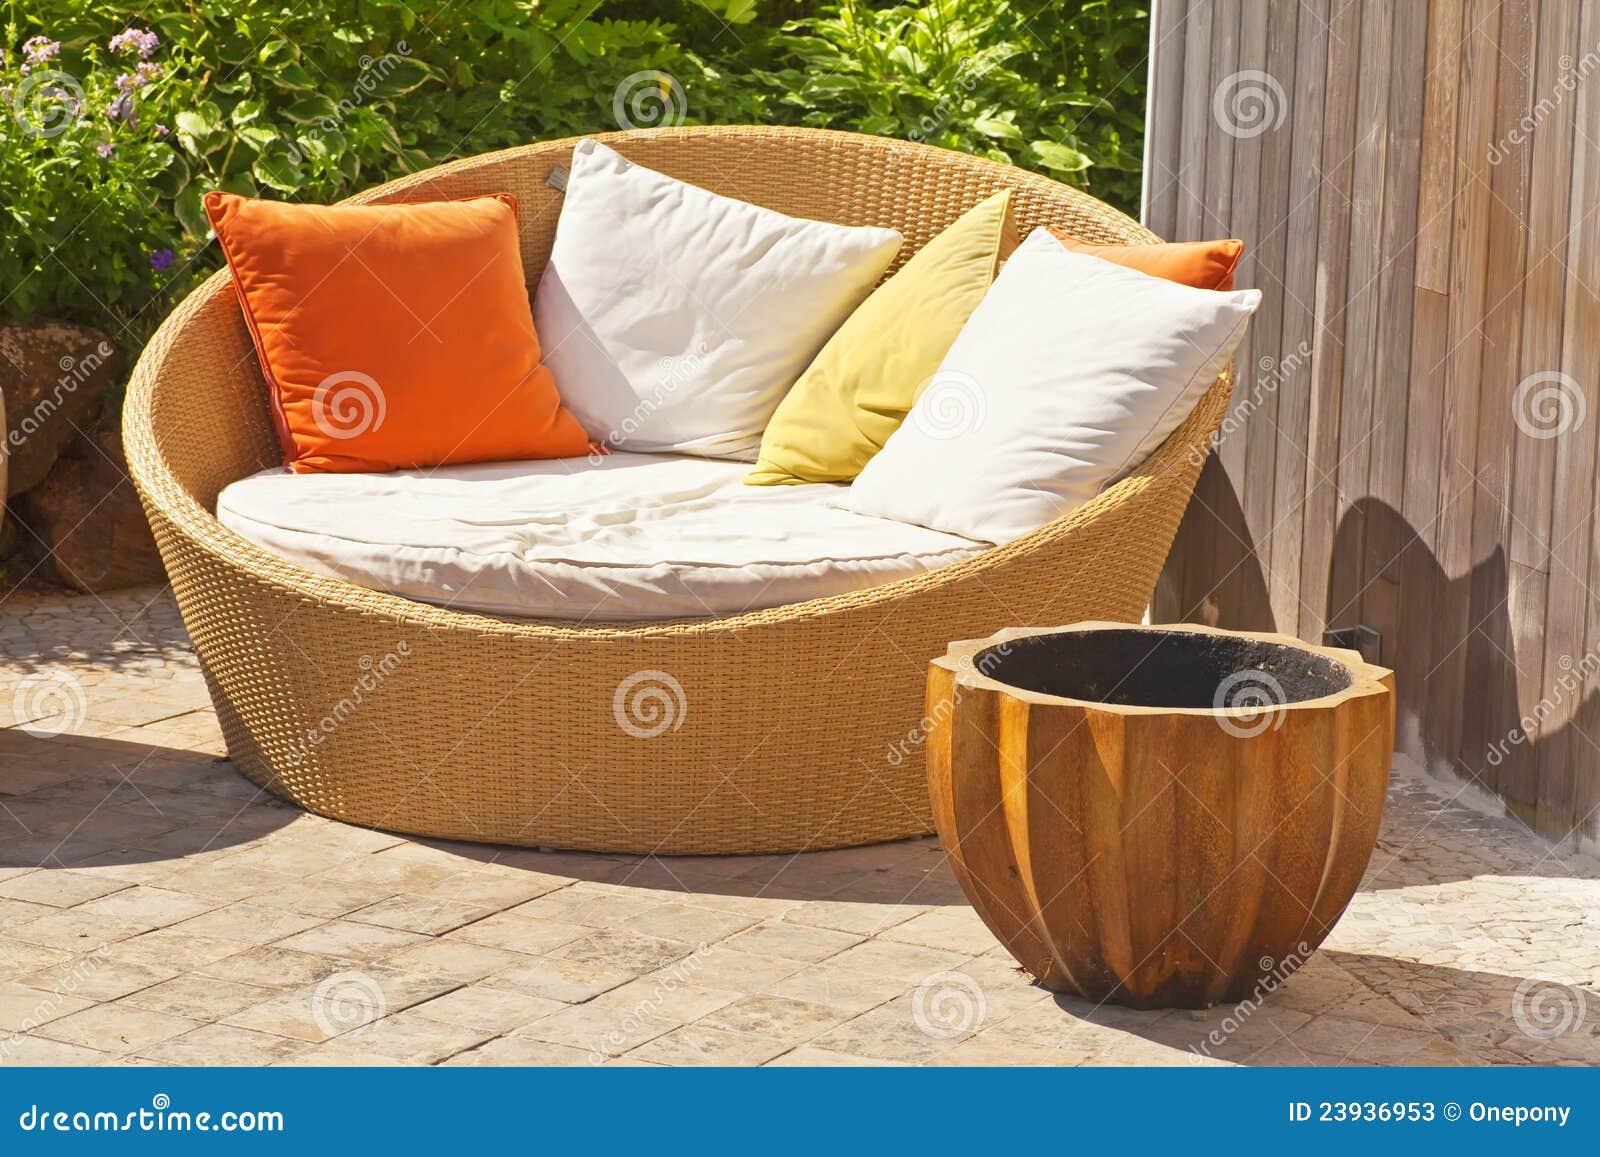 Muebles De Mimbre Del Jardín Imagen de archivo - Imagen de ...